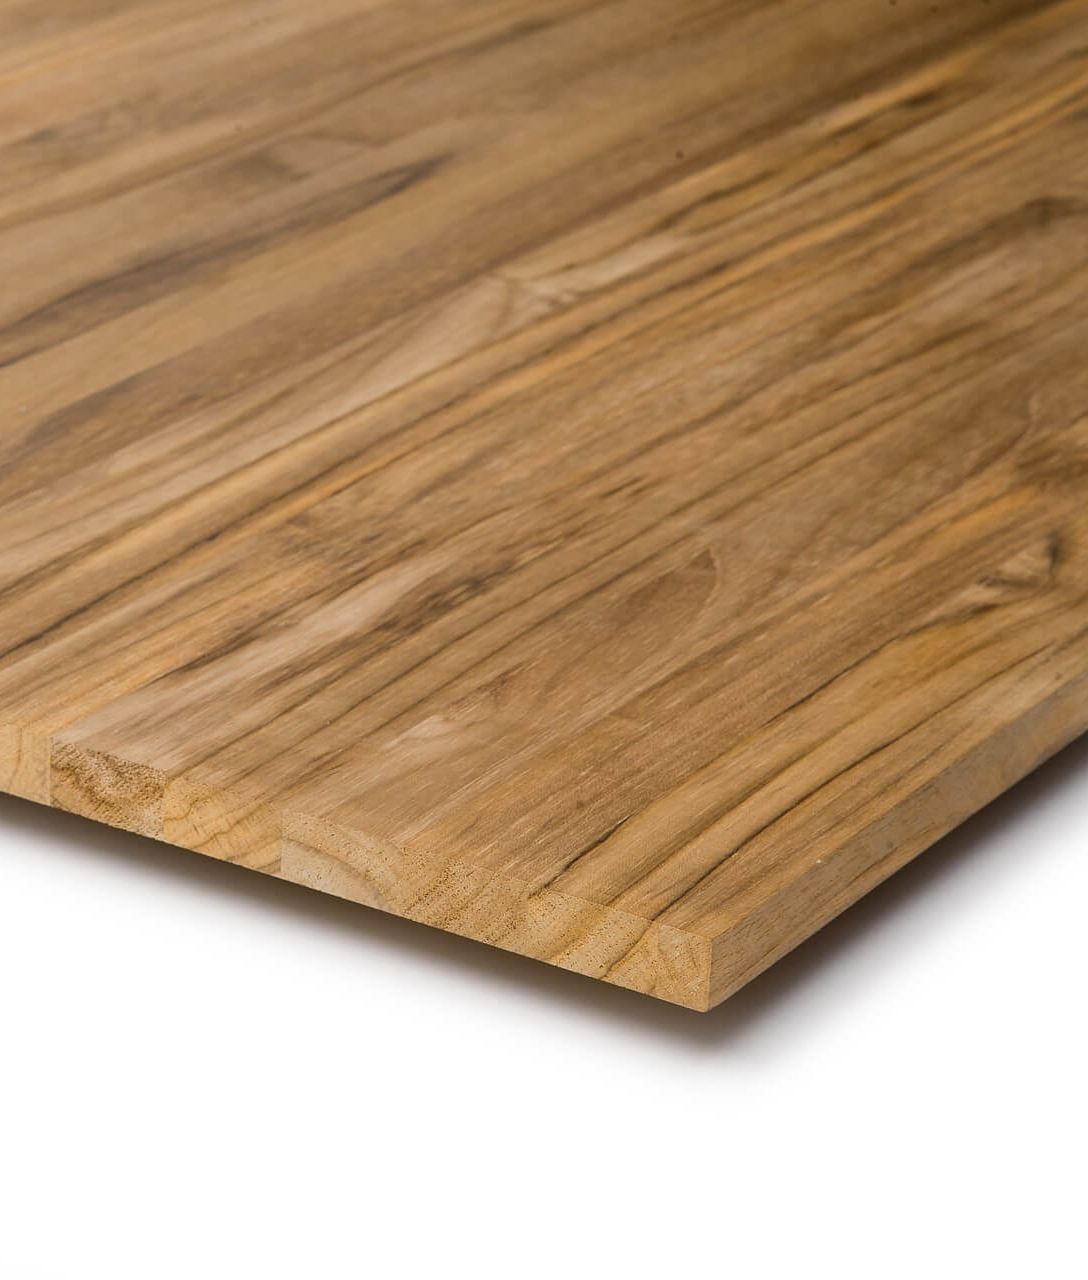 Massivholzplatte Teakholz 18mm Kaufen Mobelbau Teak Holz Arbeitsplatte Holz Teakholz